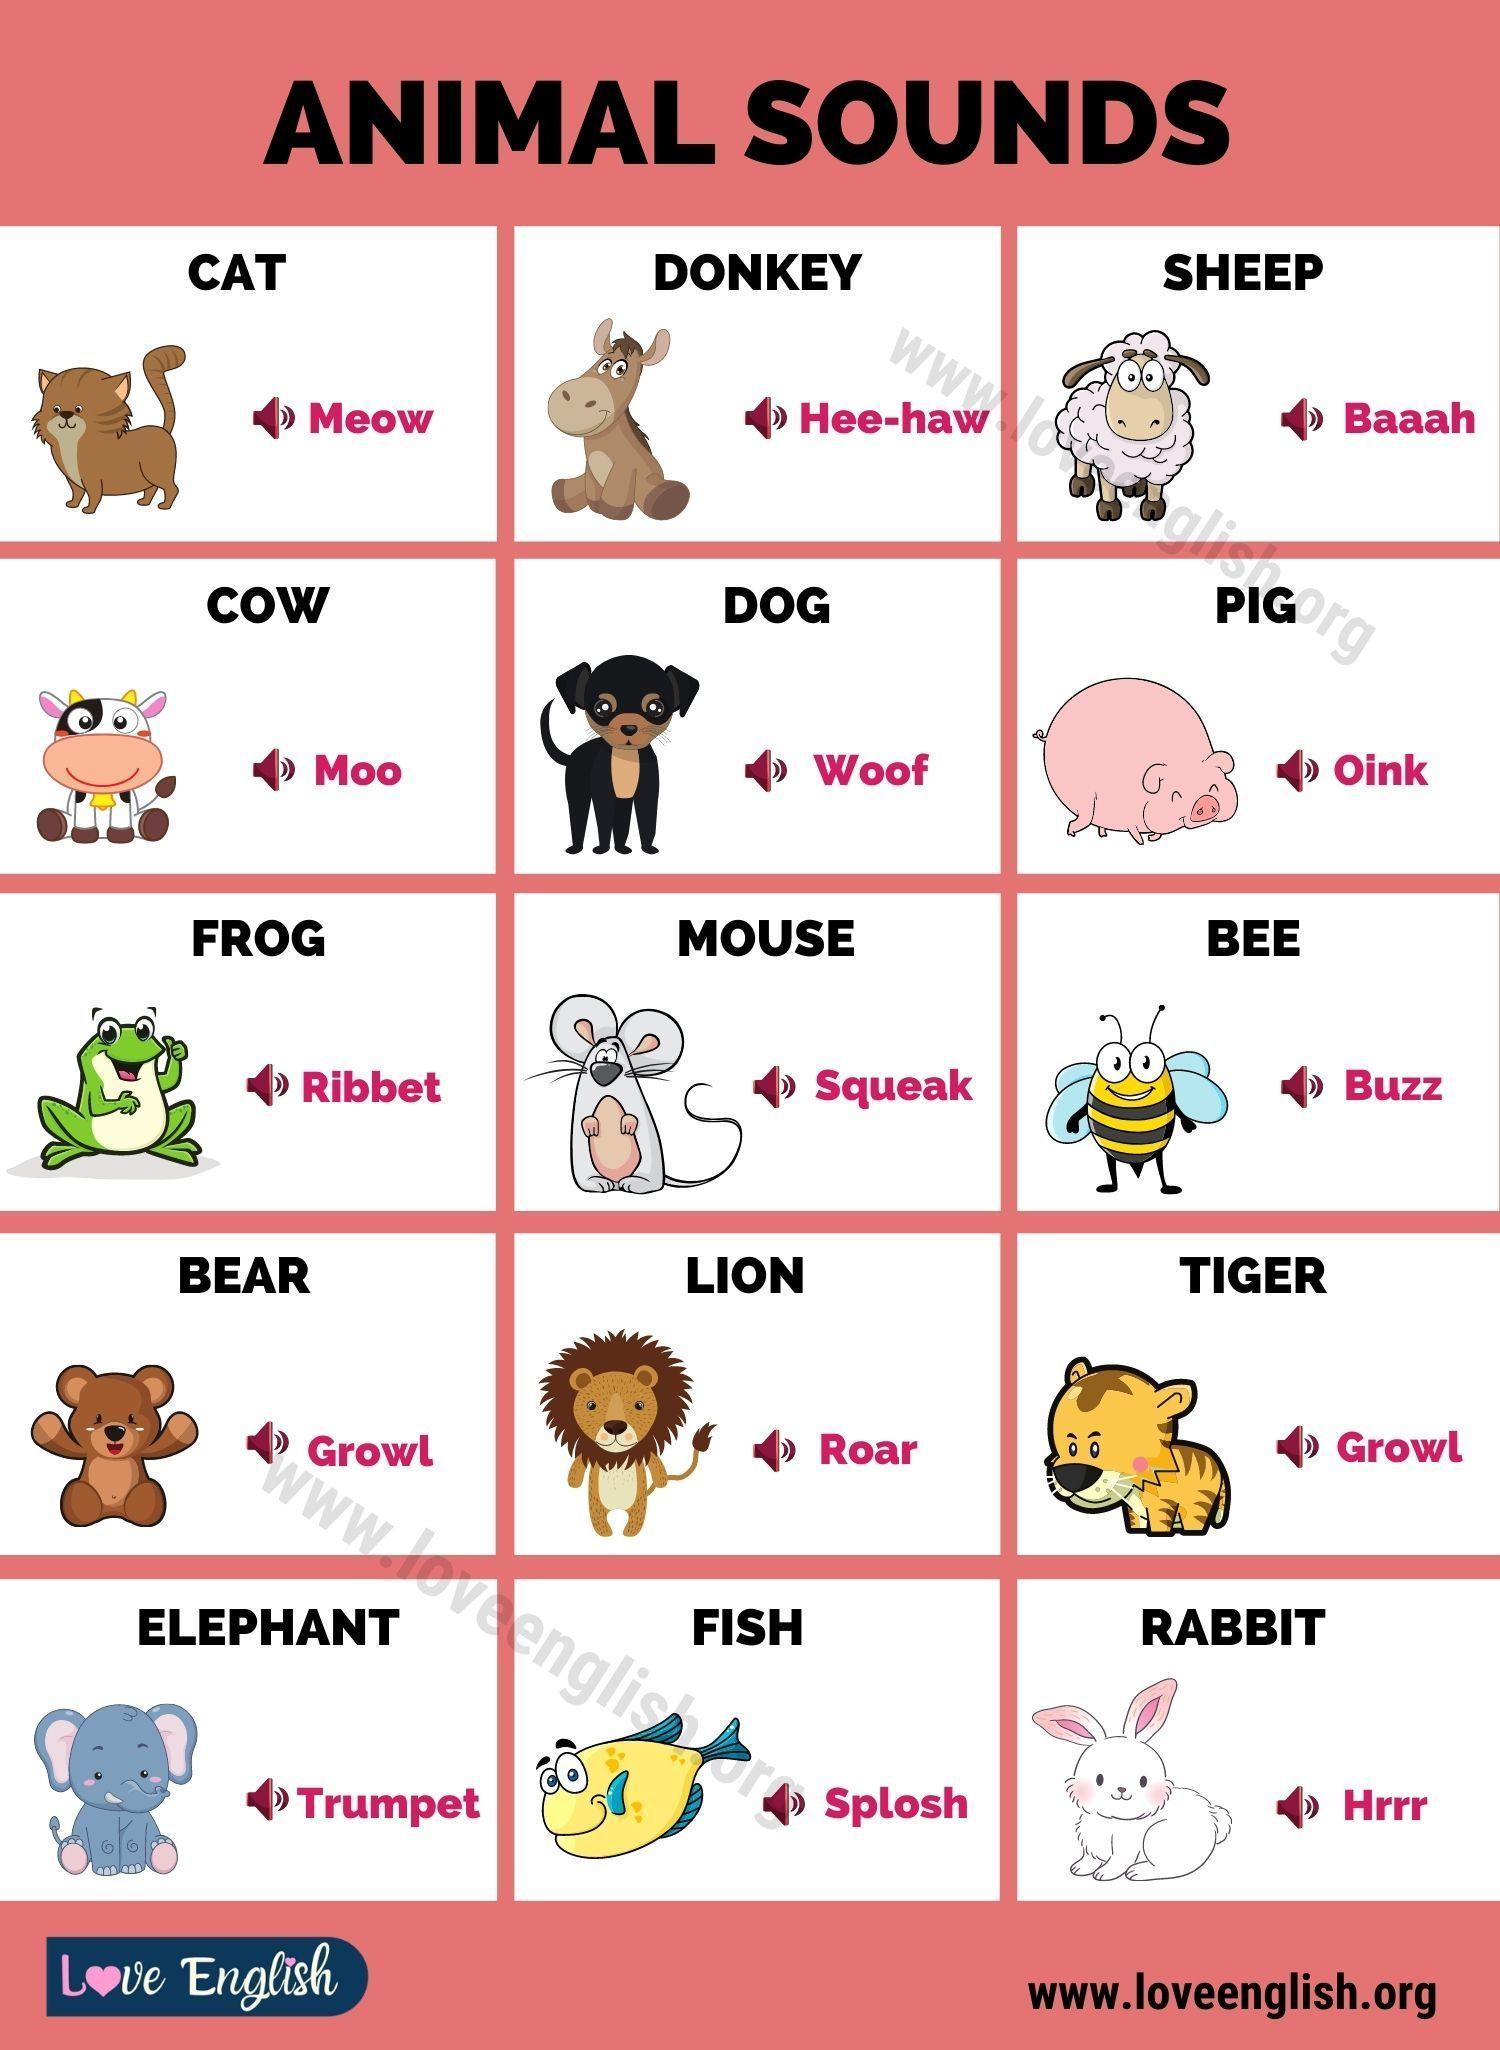 Animal Sounds Interesting List Of Animal Sounds For Kids